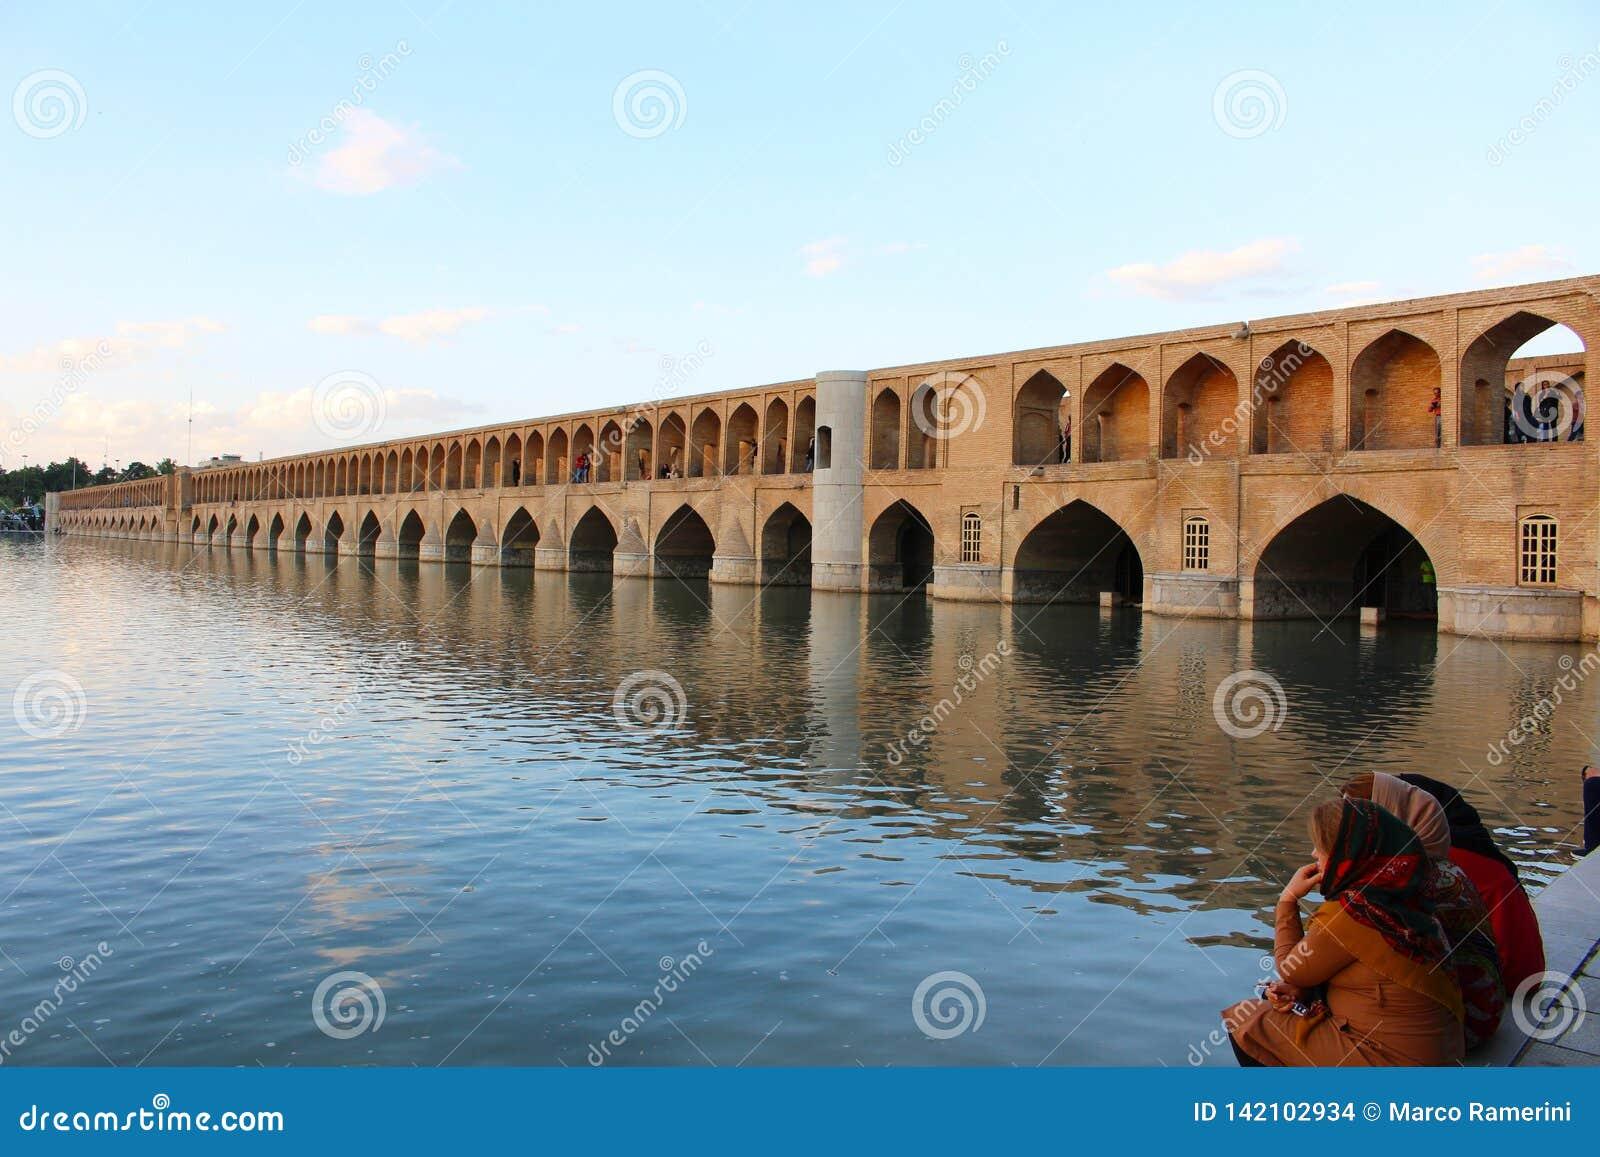 Bridge arches. Si-o-se-pol Bridge in Isfahan, Iran